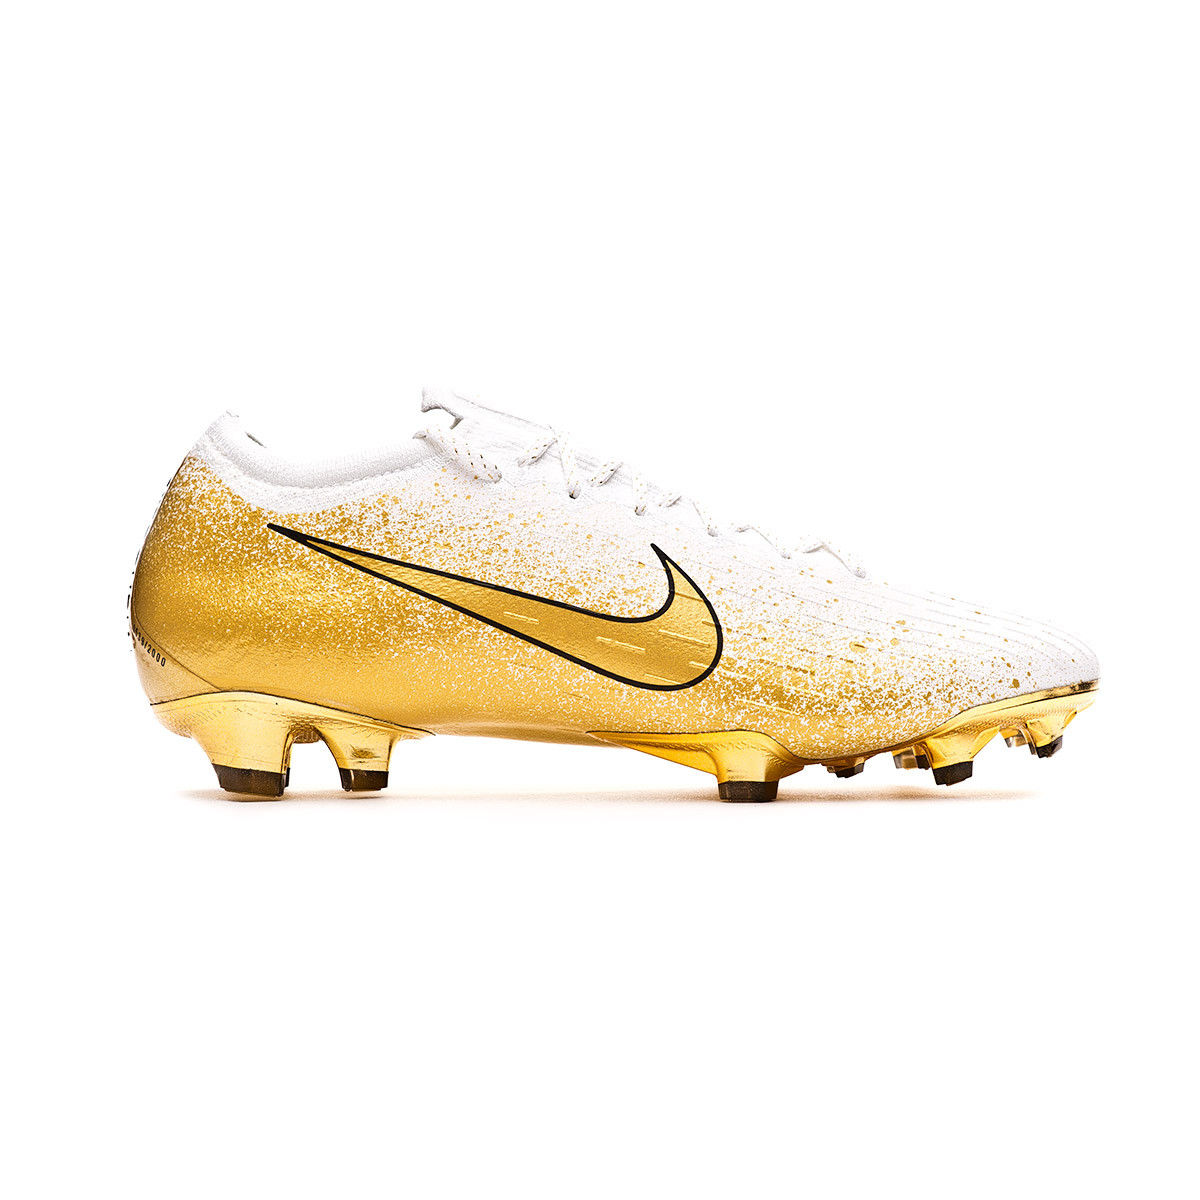 Football Boots Nike Vapor XII Elite FG